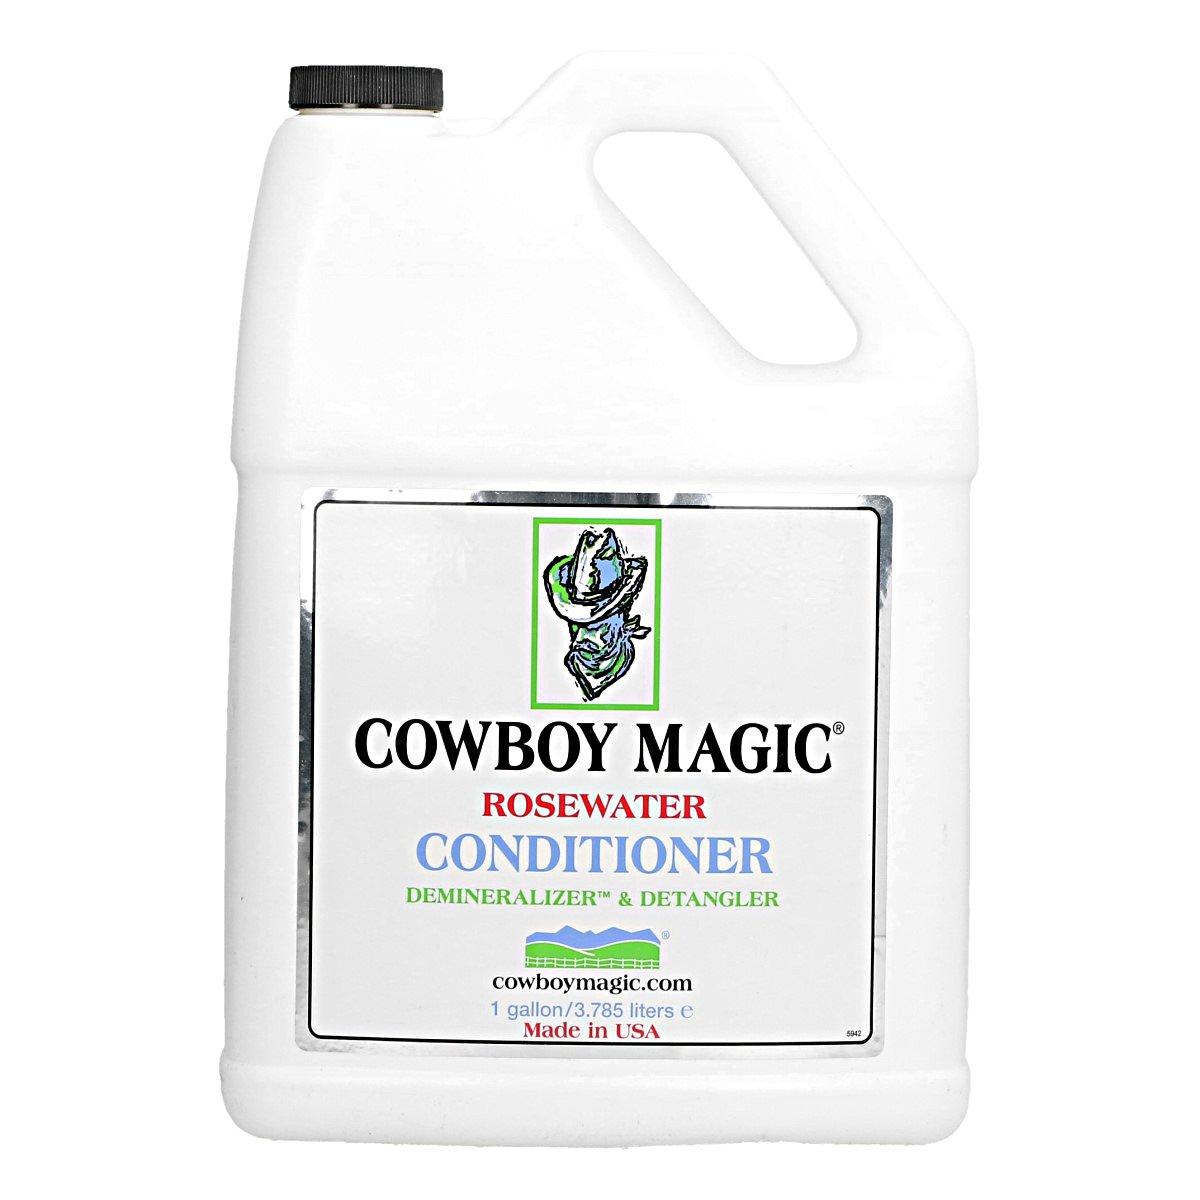 Afbeelding van Cowboy Magic Rosewater Conditioner 3785ml